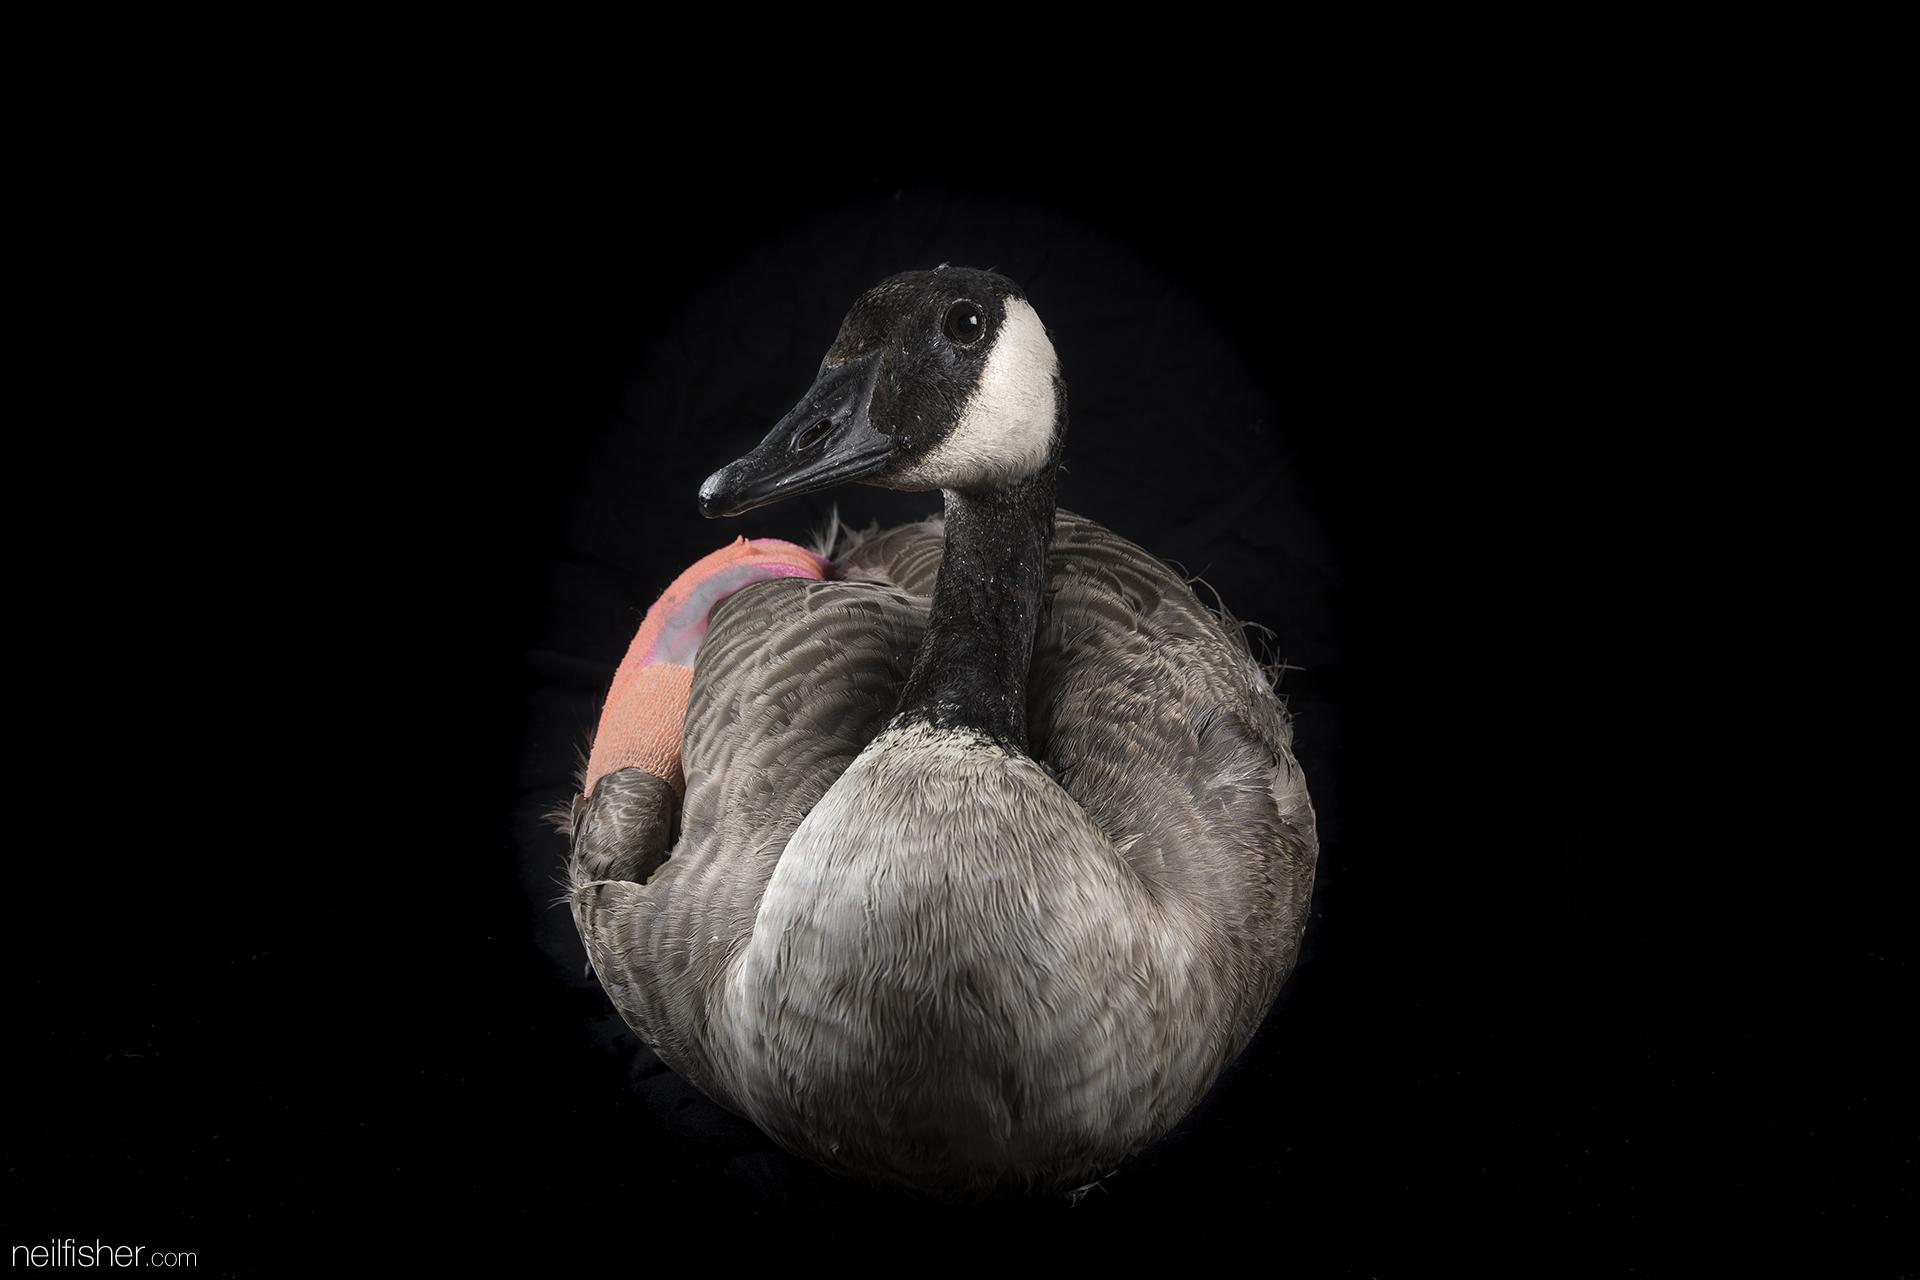 20170914 - Canada Goose (1) - NeilFisher.jpg